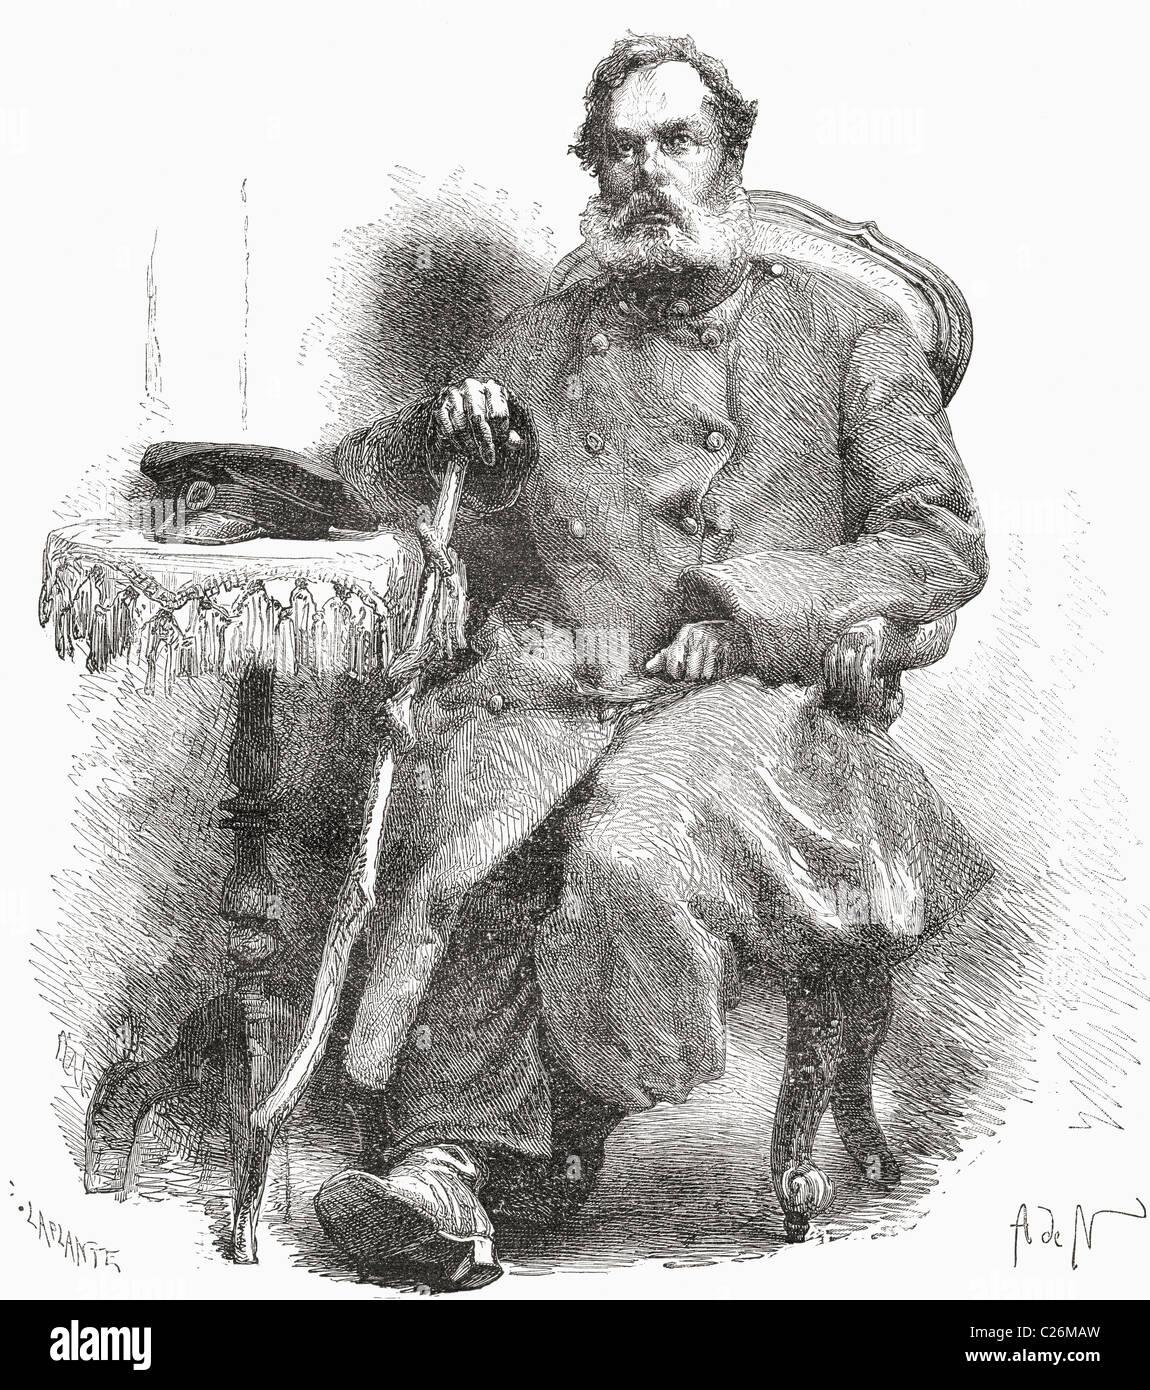 Nikolai Sazontovich Ilyin, 1809 to 1890. Russian  military officer, writer and religious thinker. - Stock Image